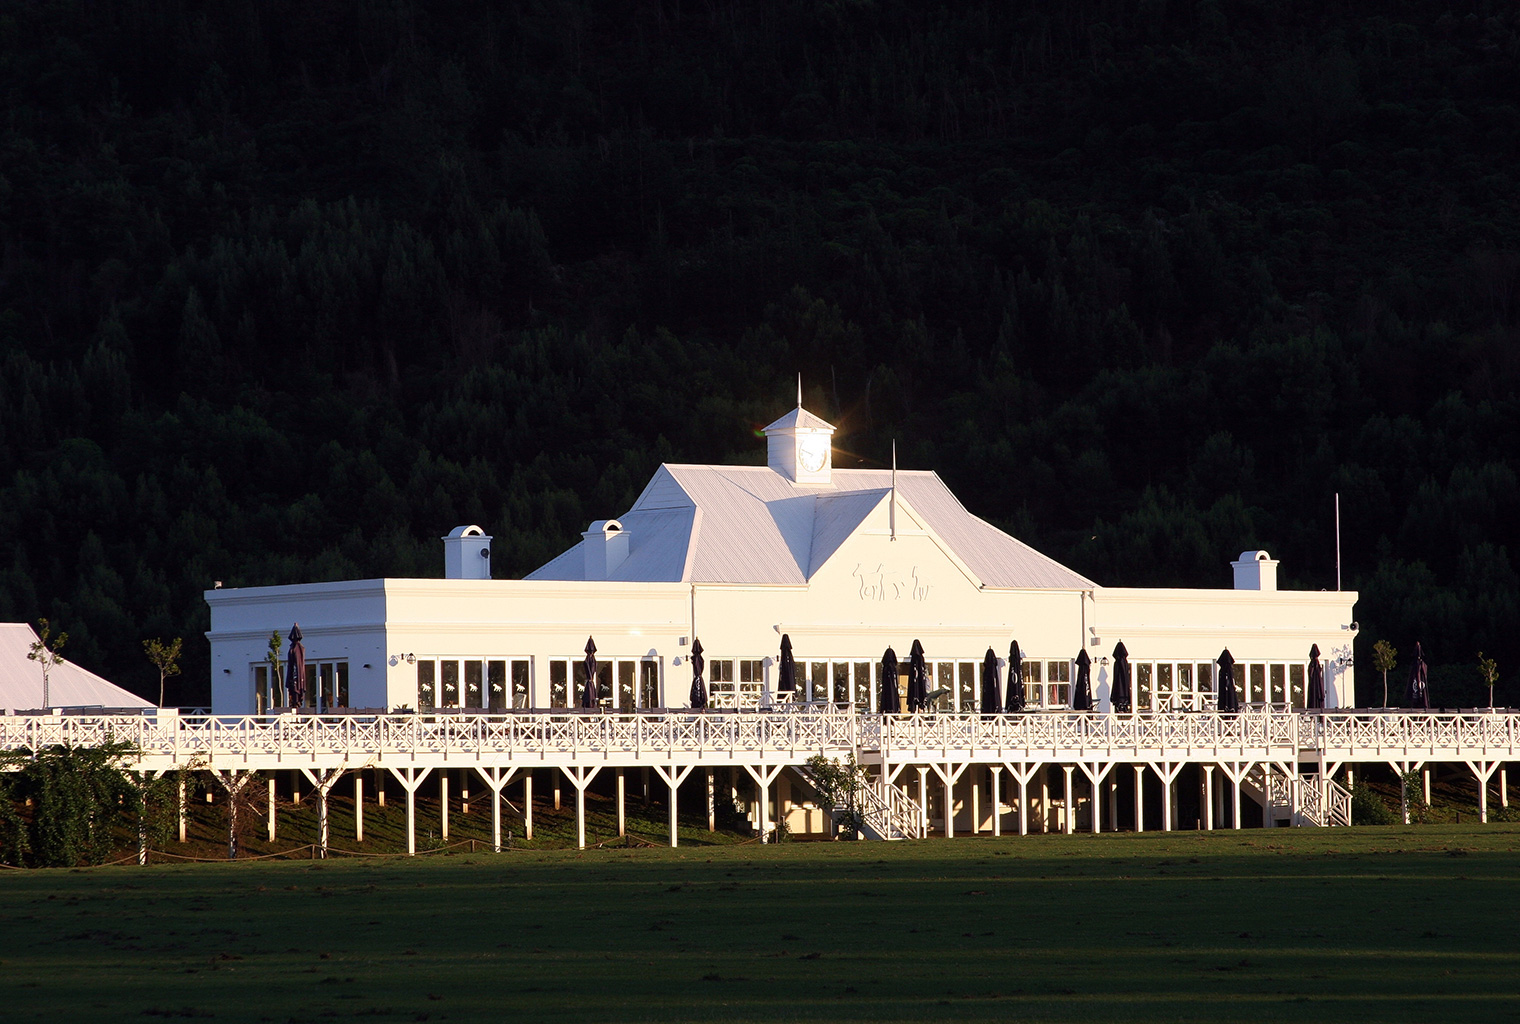 Kurland-Luxury-Hotel-South-Africa-Pavillion-Close